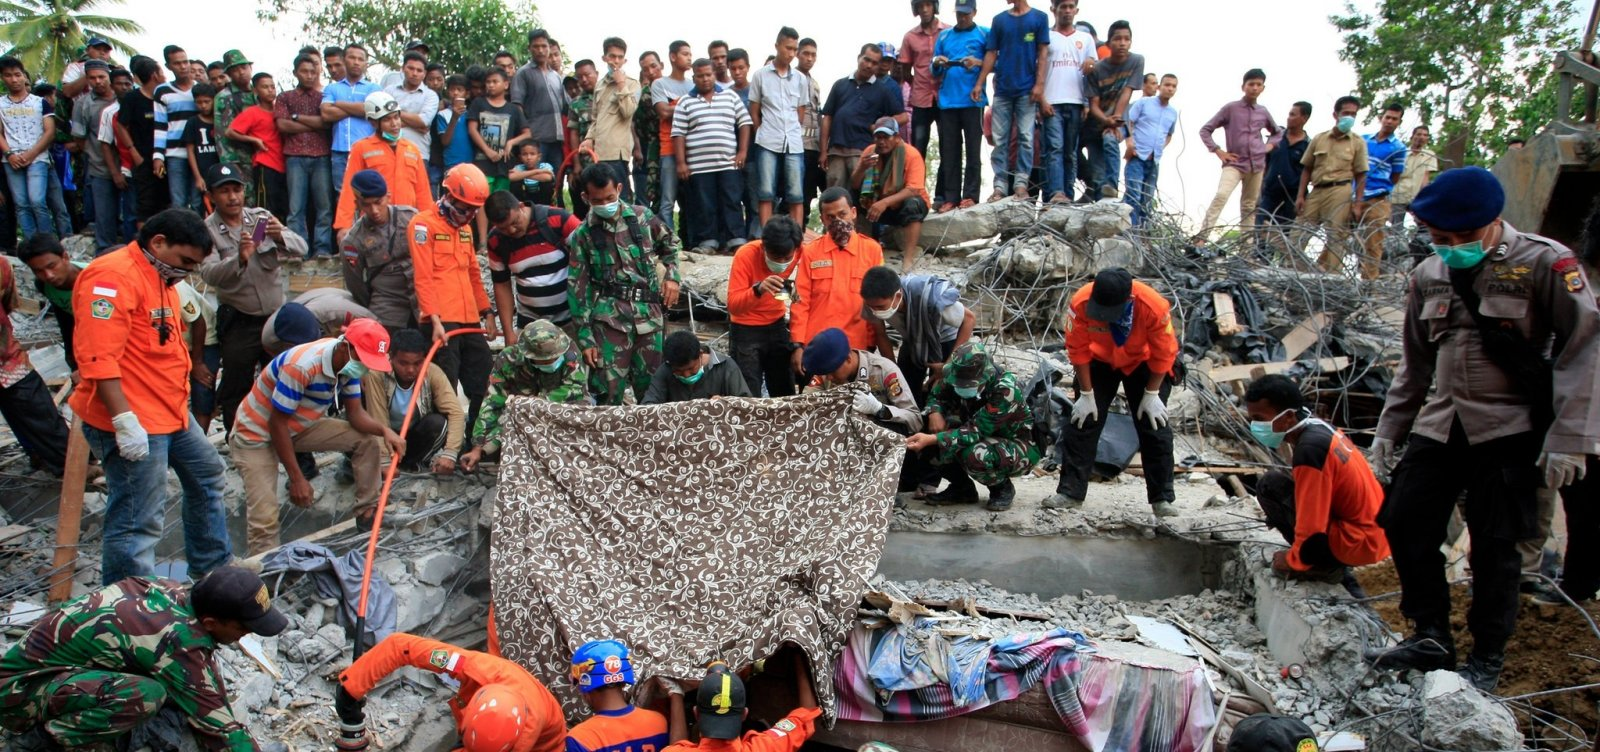 [Após terremoto e tsunami, 1,2 mil presos escapam na Indonésia]